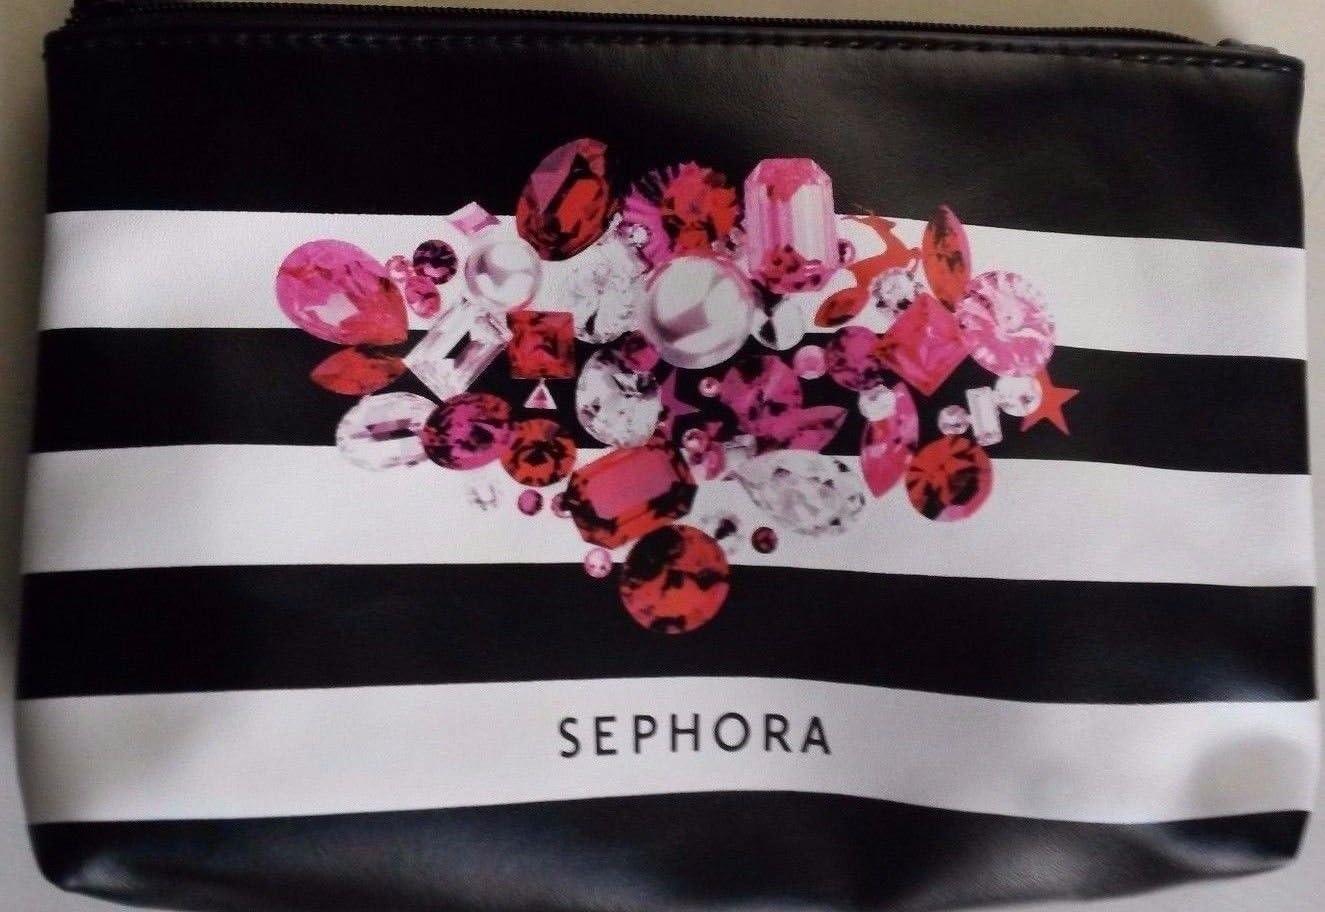 Sephora rayas negro blanco rosa rojo Gem con cremallera bolsa de maquillaje bolsa: Amazon.es: Belleza